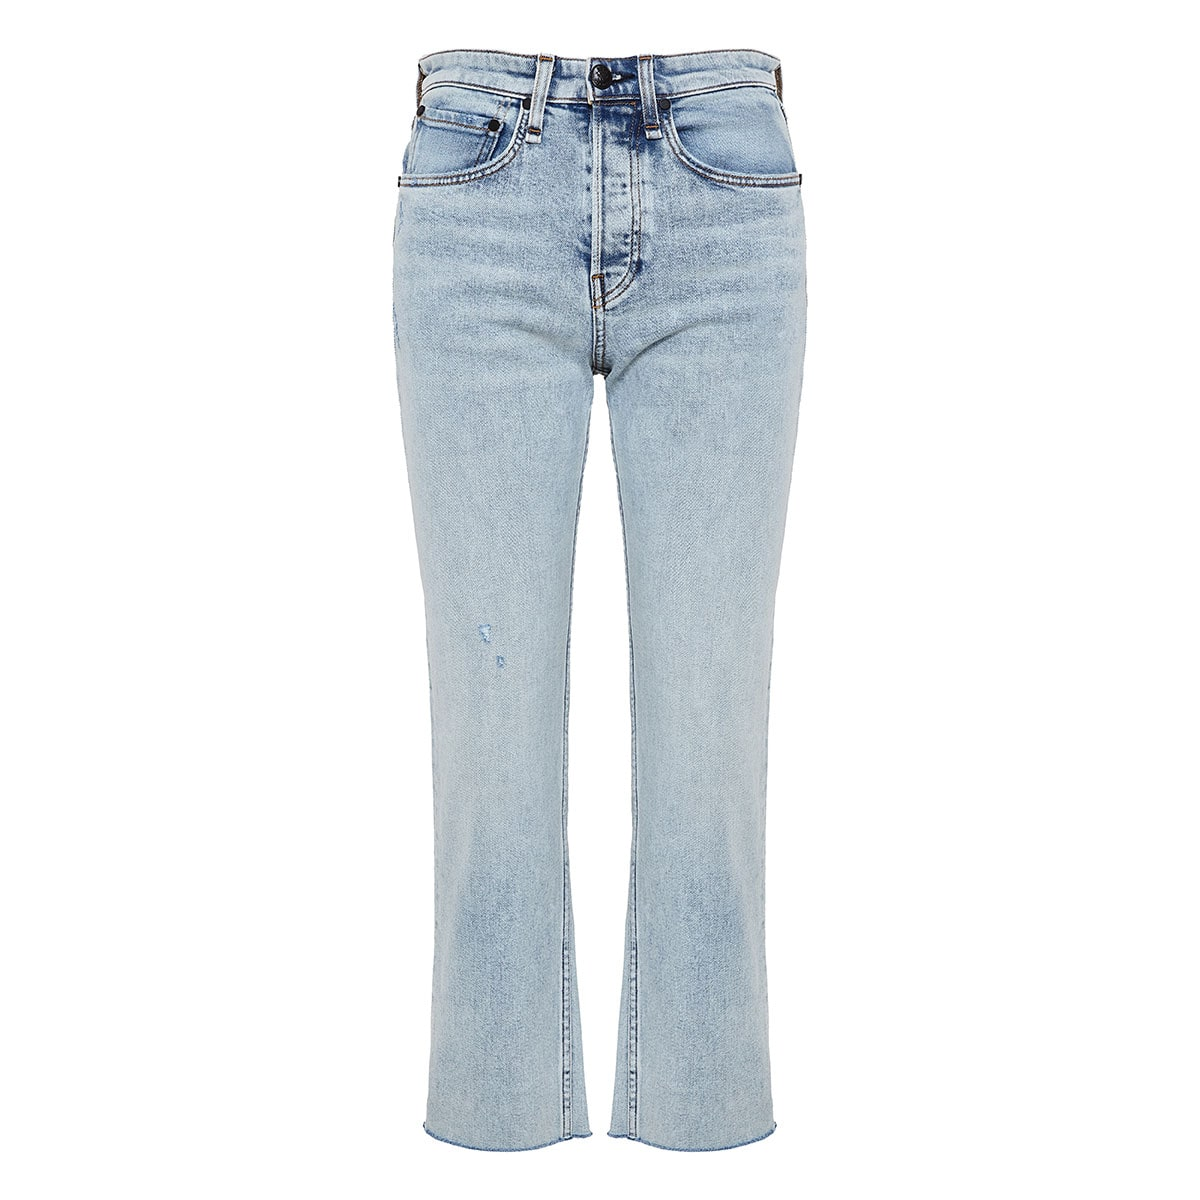 Maya high-waist cropped jeans